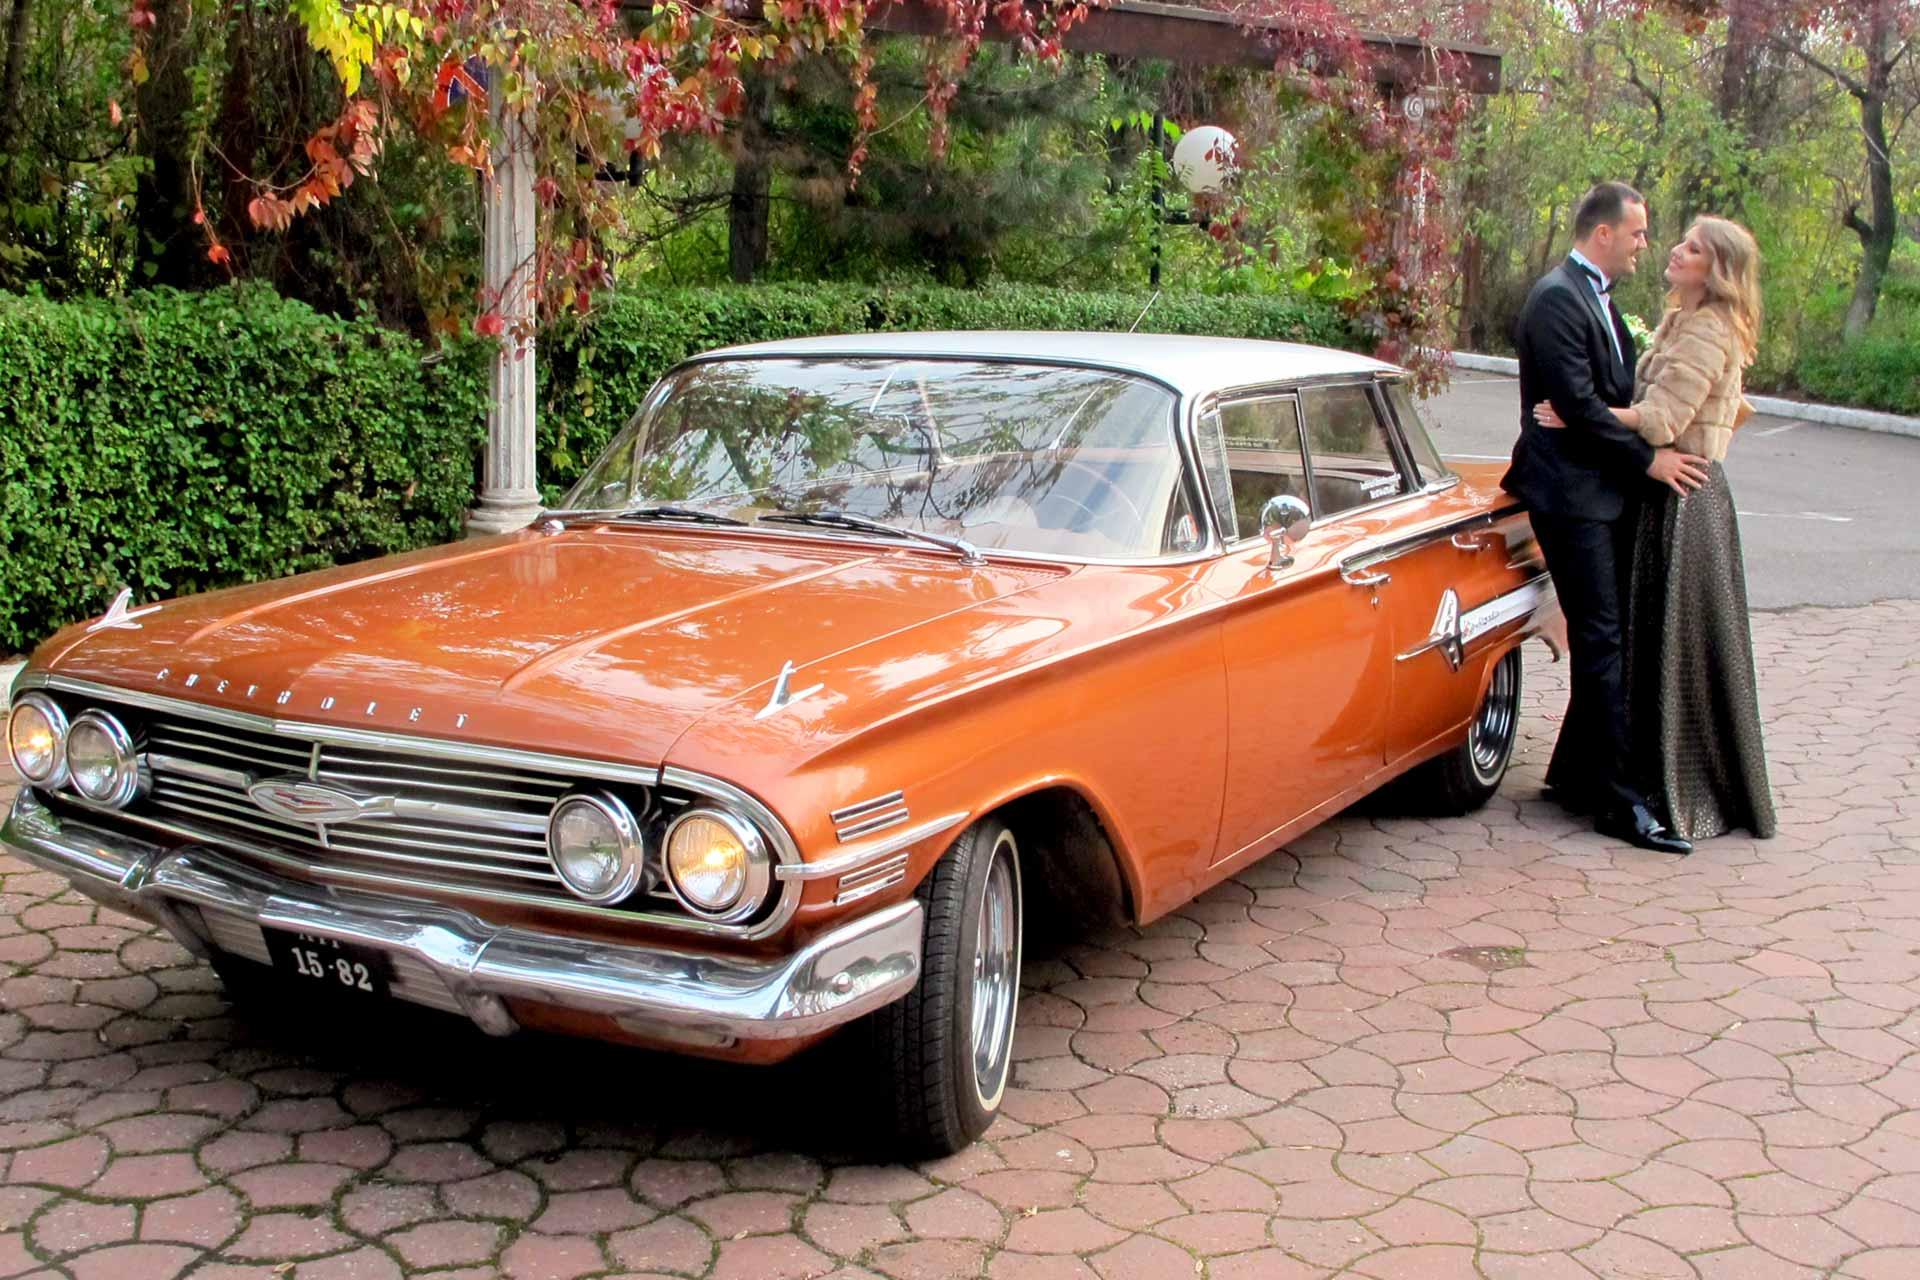 Masina de epoca Chevrolet Impala de inchiriat pentru nunti